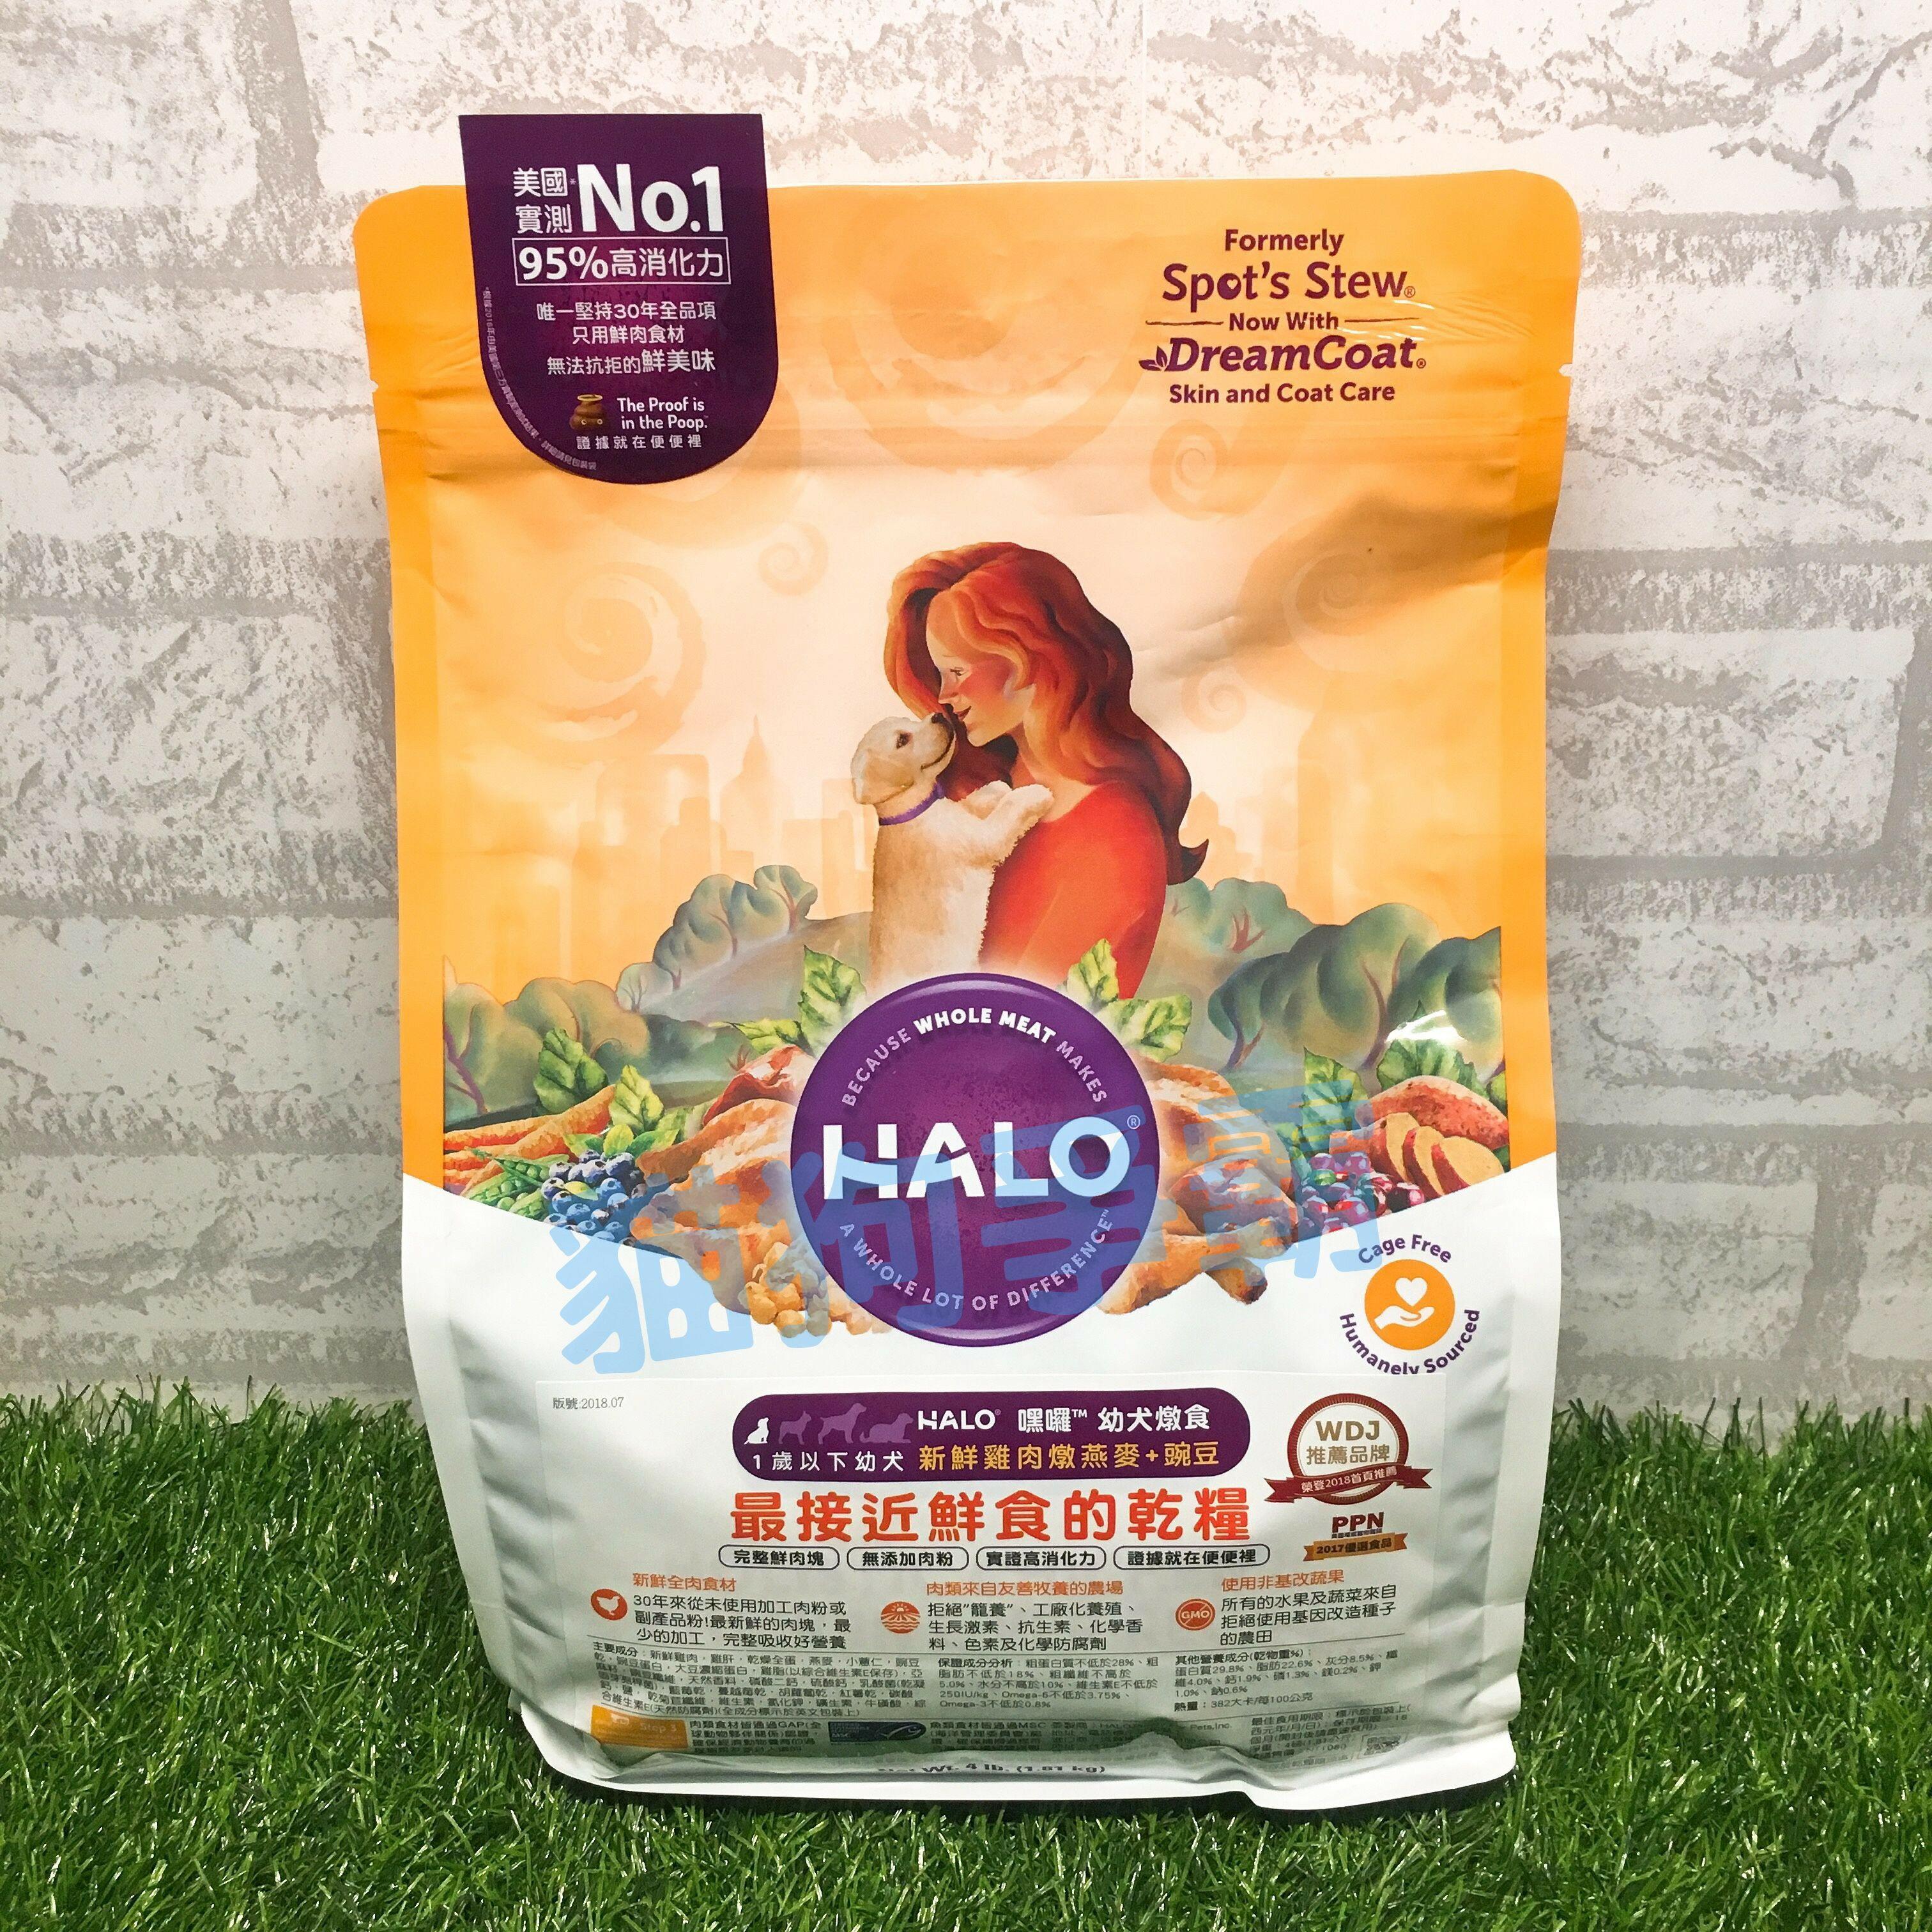 Halo 嘿囉 幼犬 新鮮雞肉燉燕麥+豌豆 4磅 無穀飼料 狗飼料 幼犬飼料 WDJ推薦